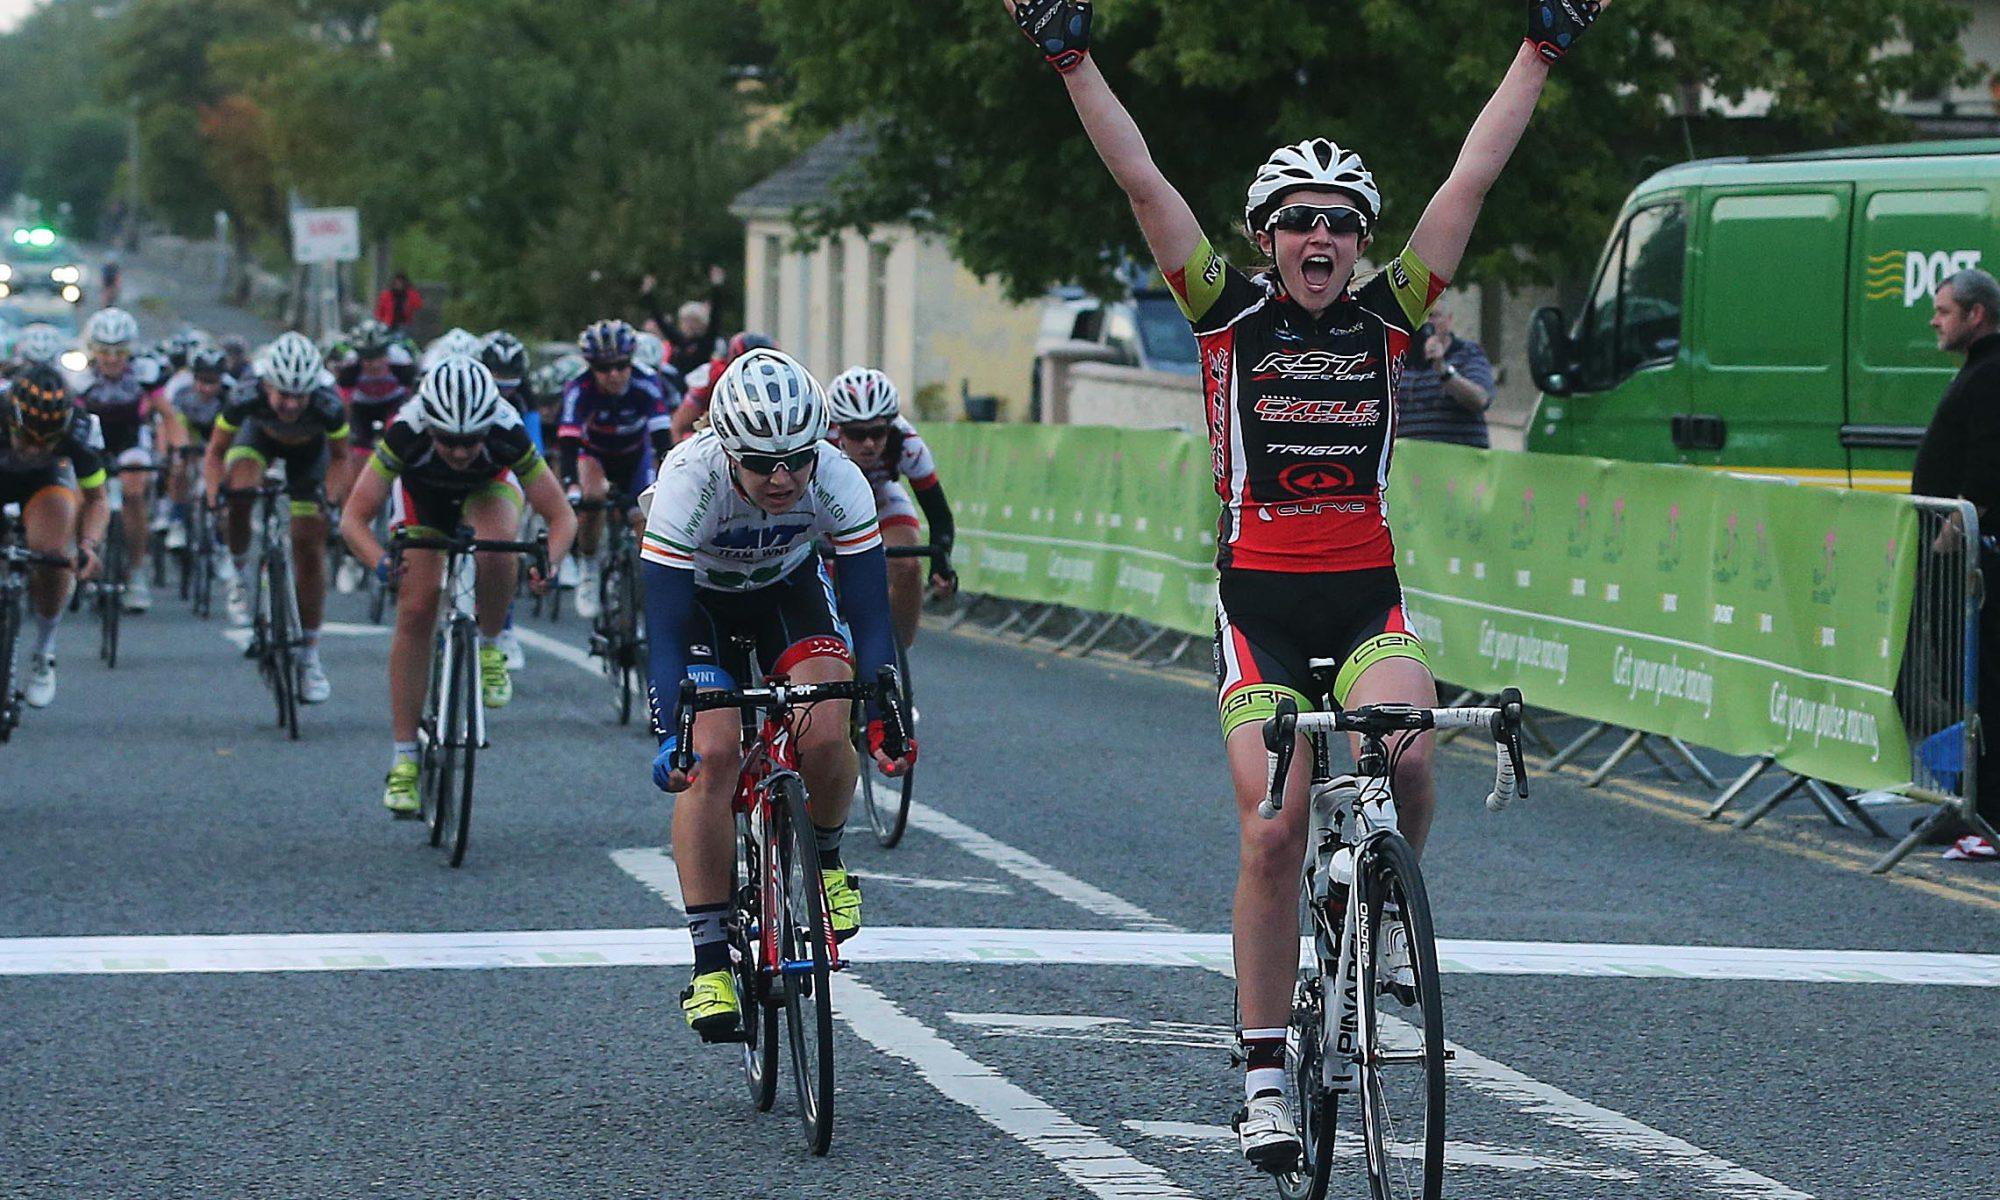 2015 Rás na mBan Stage 1 finish line